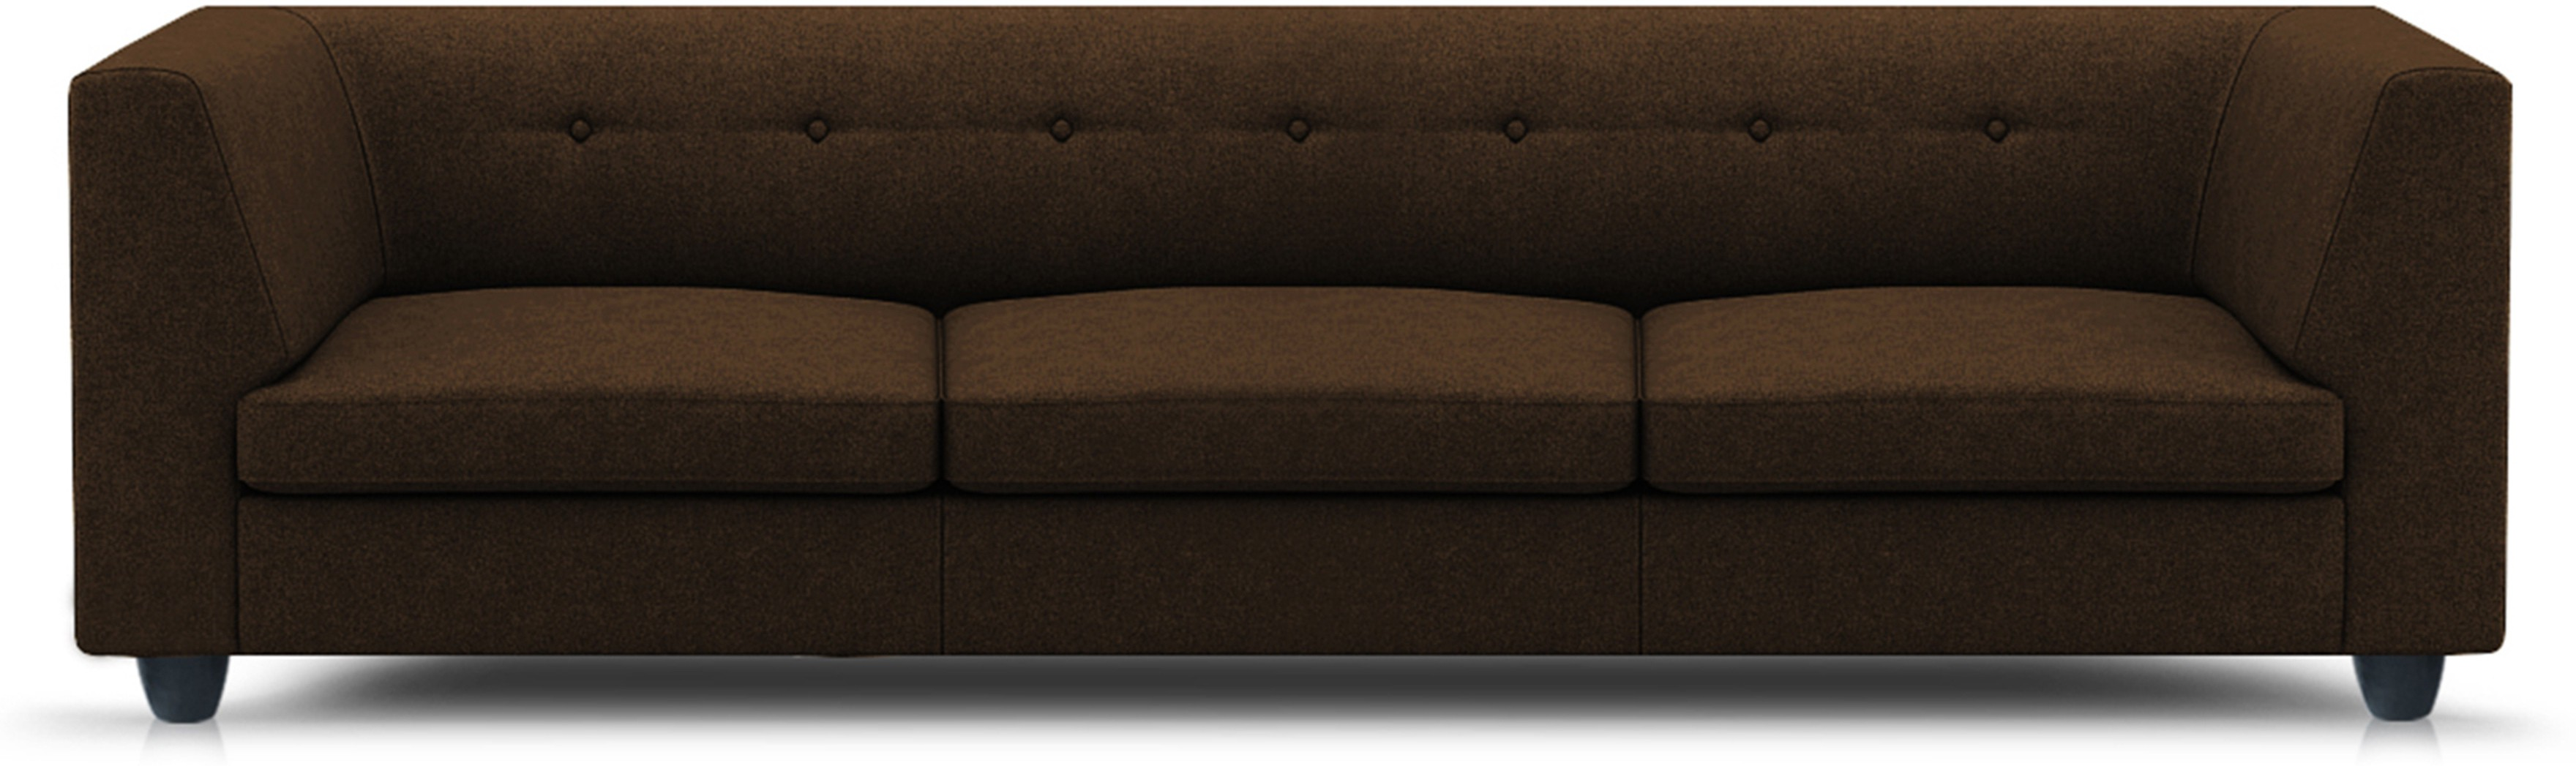 View Adorn homez Modern Solid Wood Sectional Brown Sofa Set Furniture (Adorn homez)